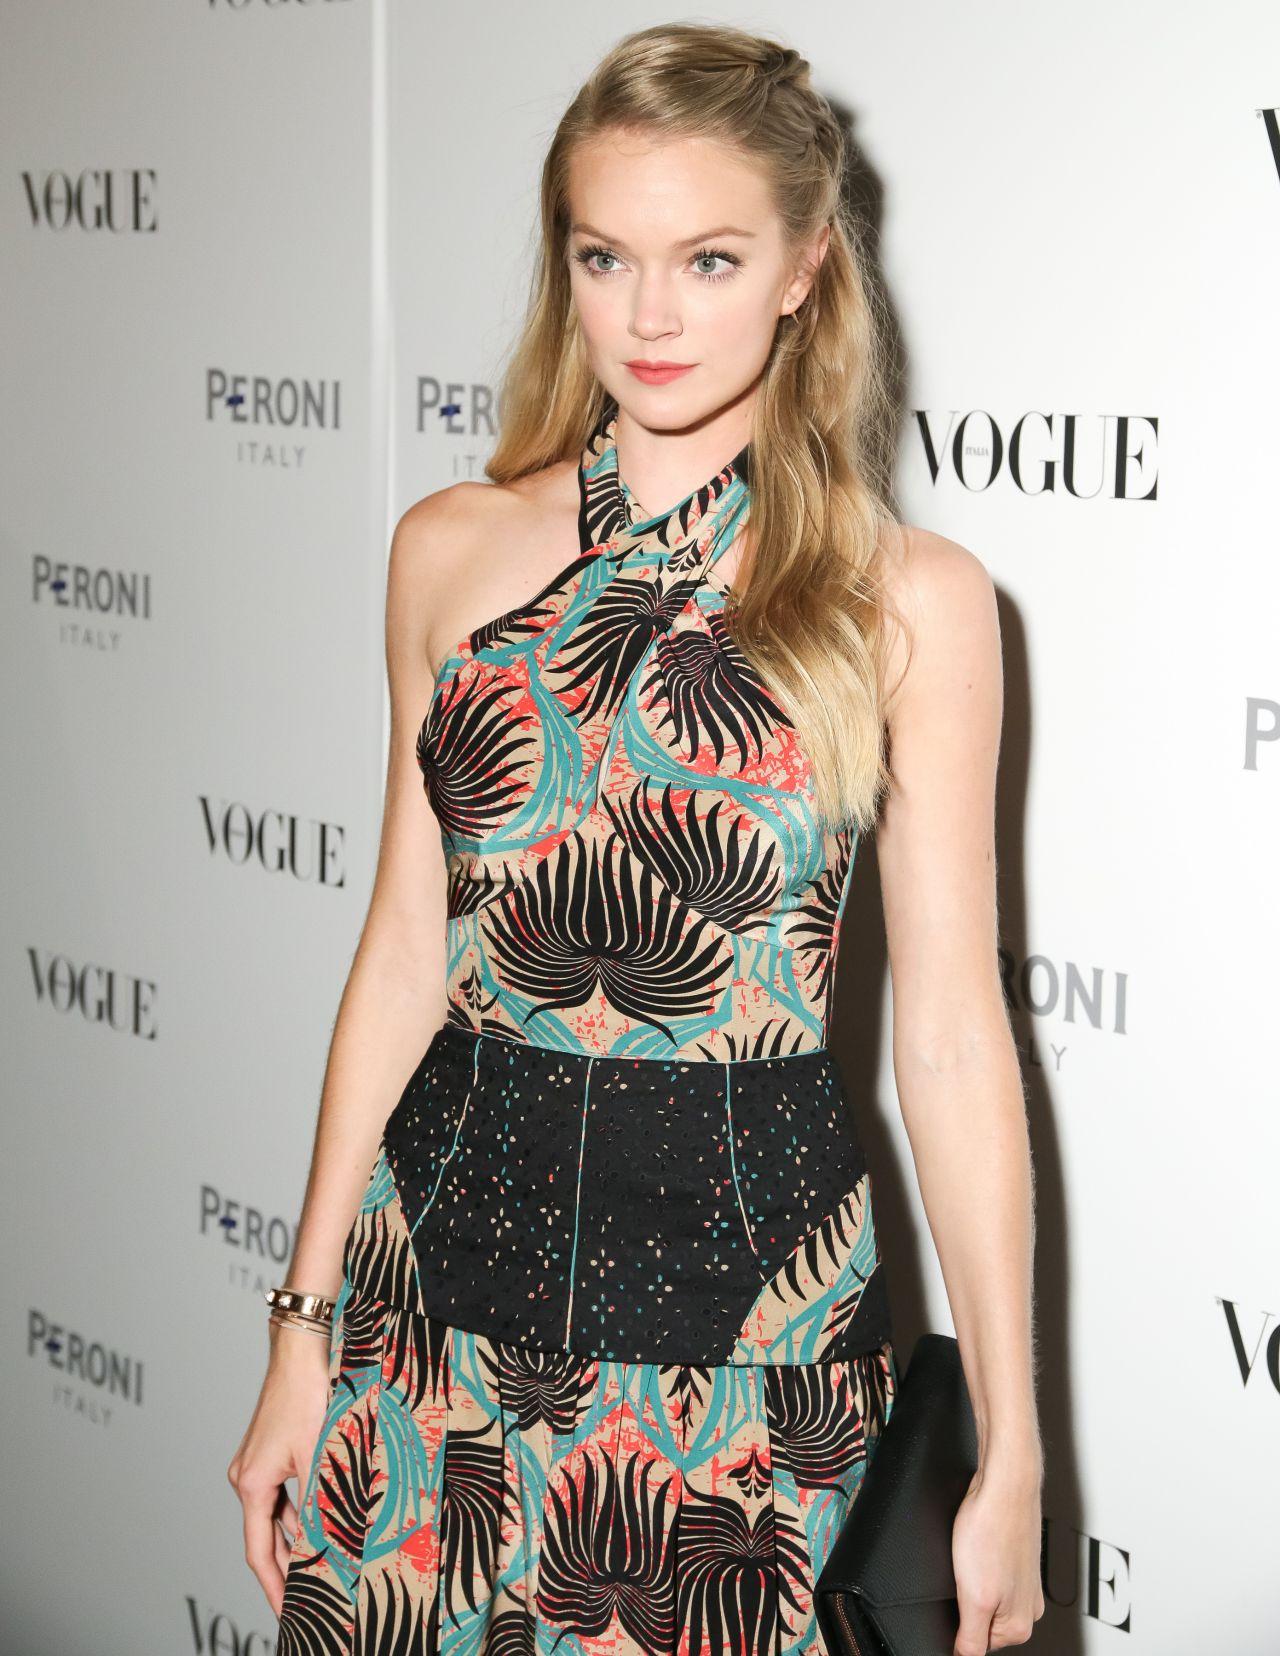 Lindsay Ellingson At The Visionary World Of Vogue Italia Exhibition